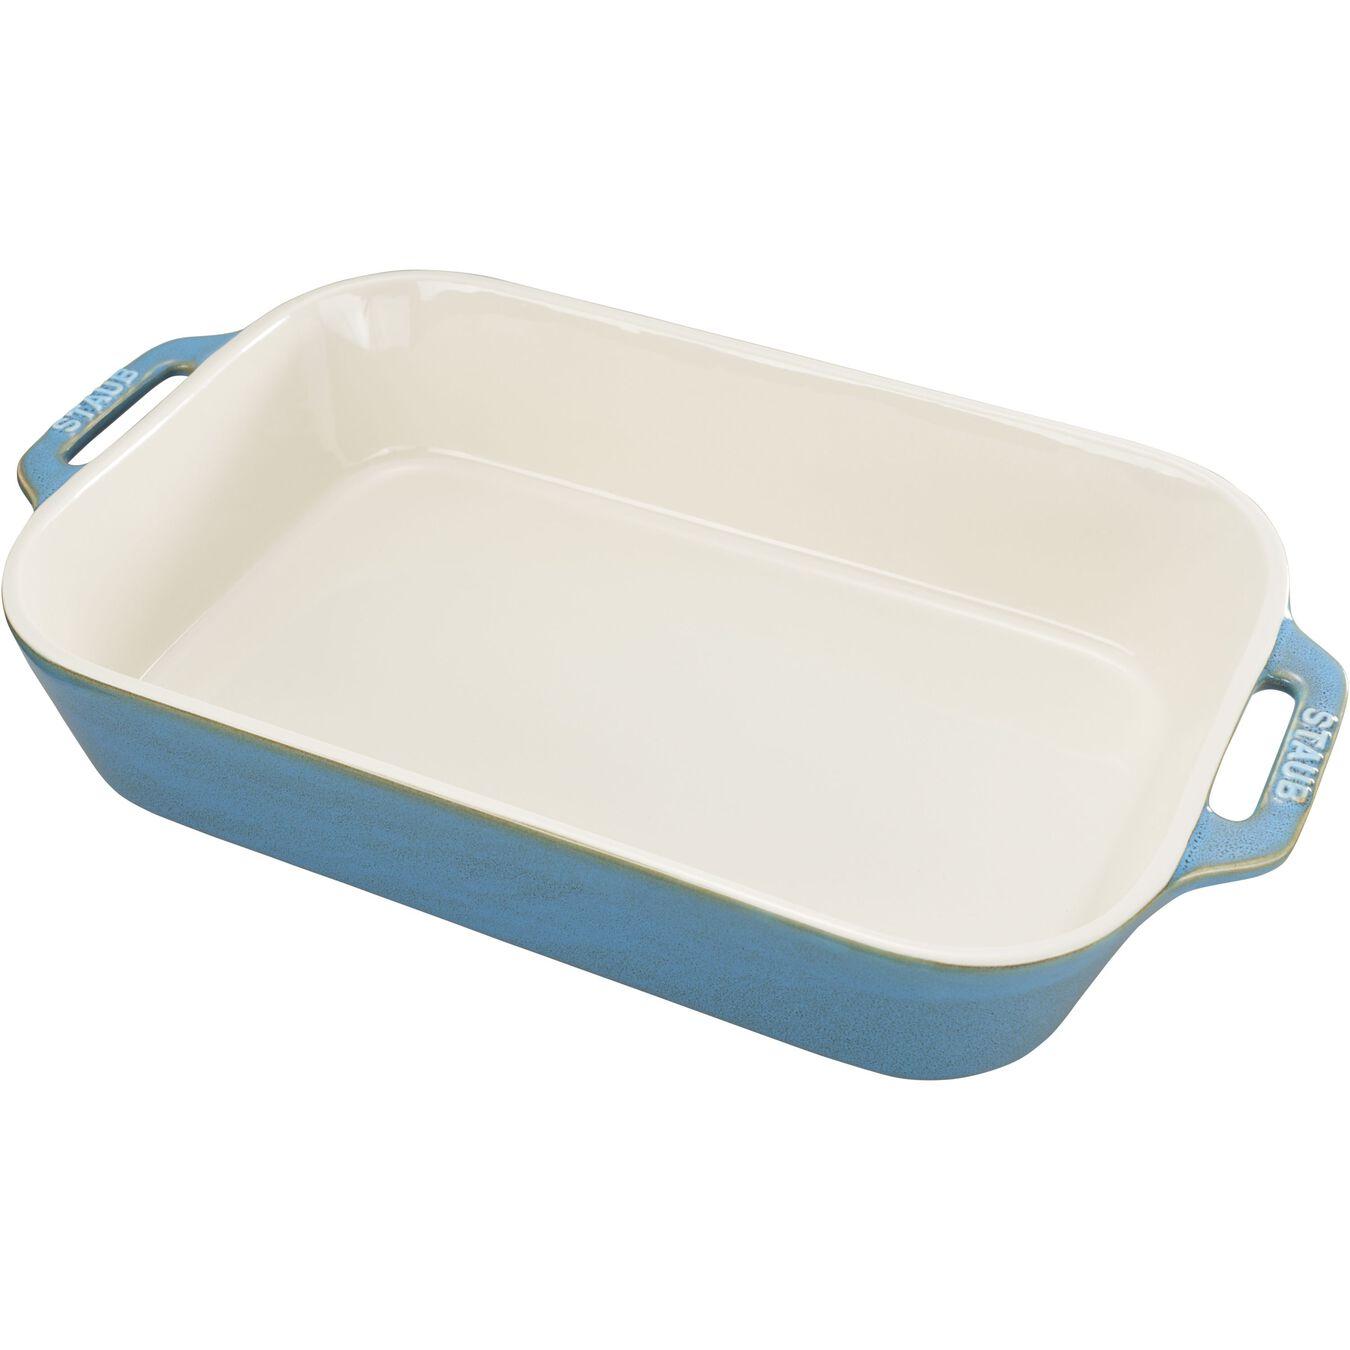 13-inch x 9-inch Rectangular Baking Dish - Rustic Turquoise  ,,large 1